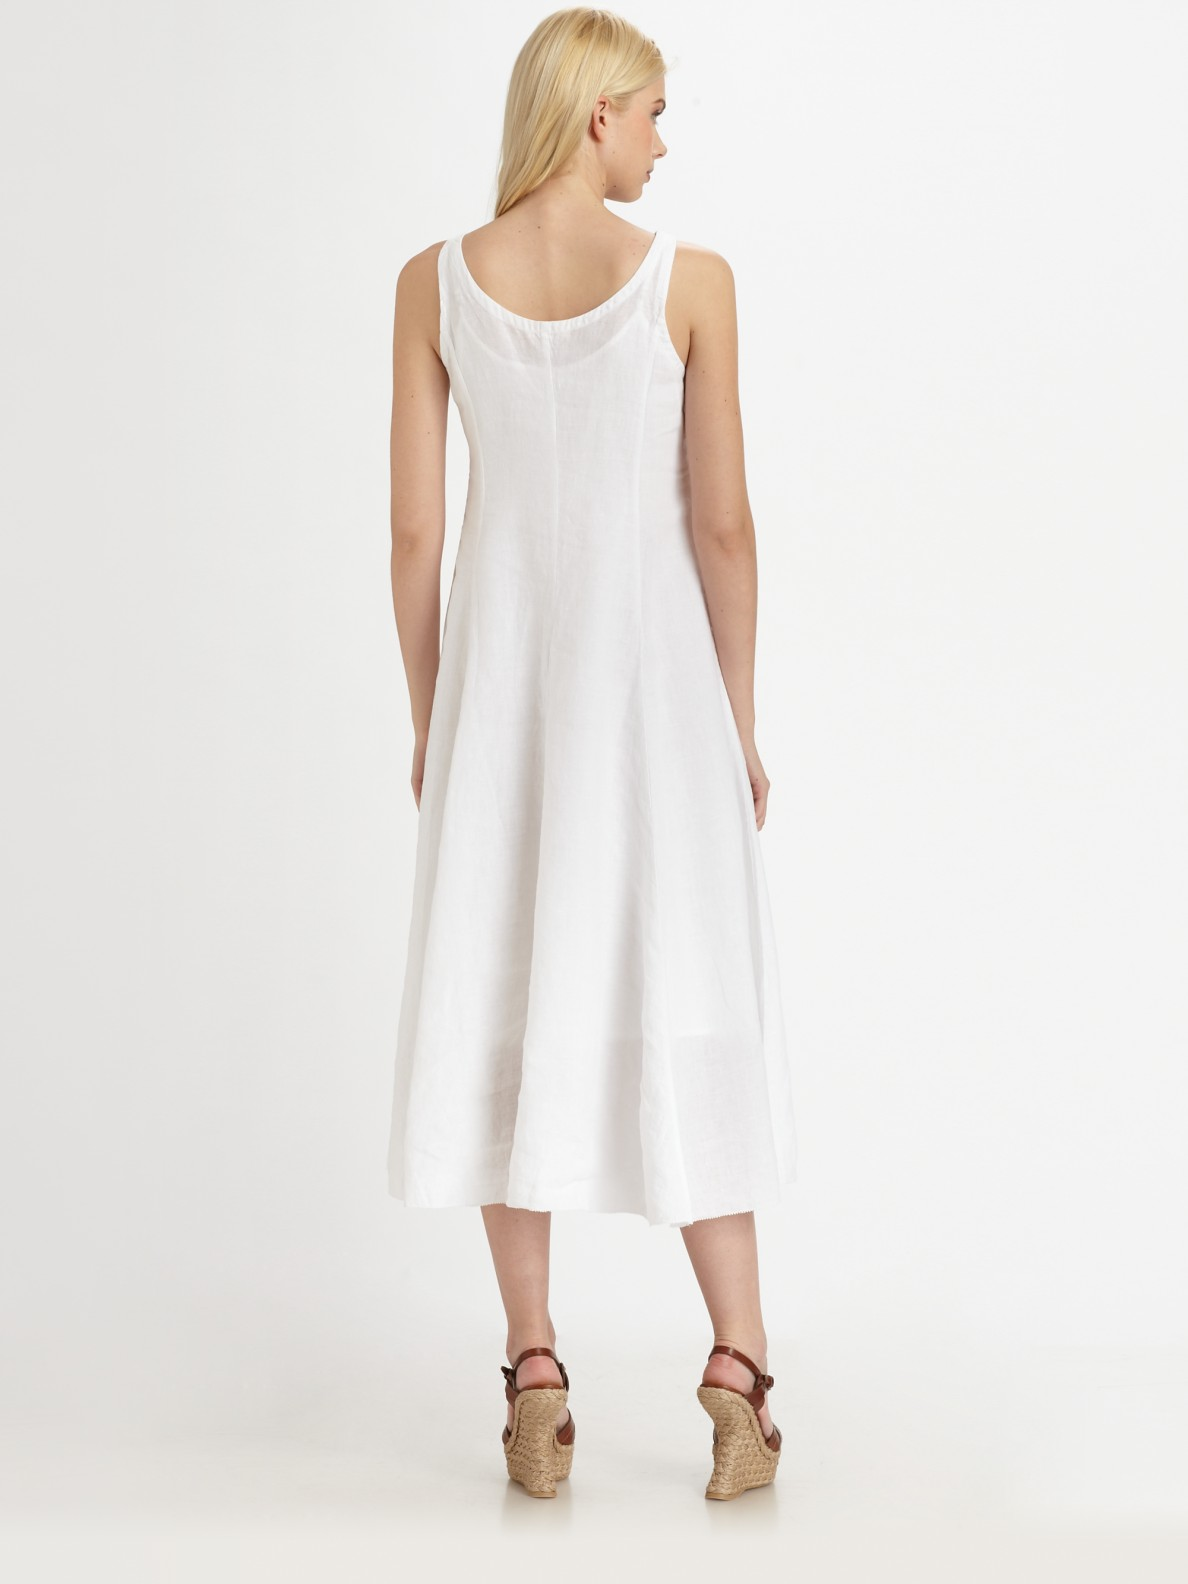 Laundry By Shelli Segal Dresses